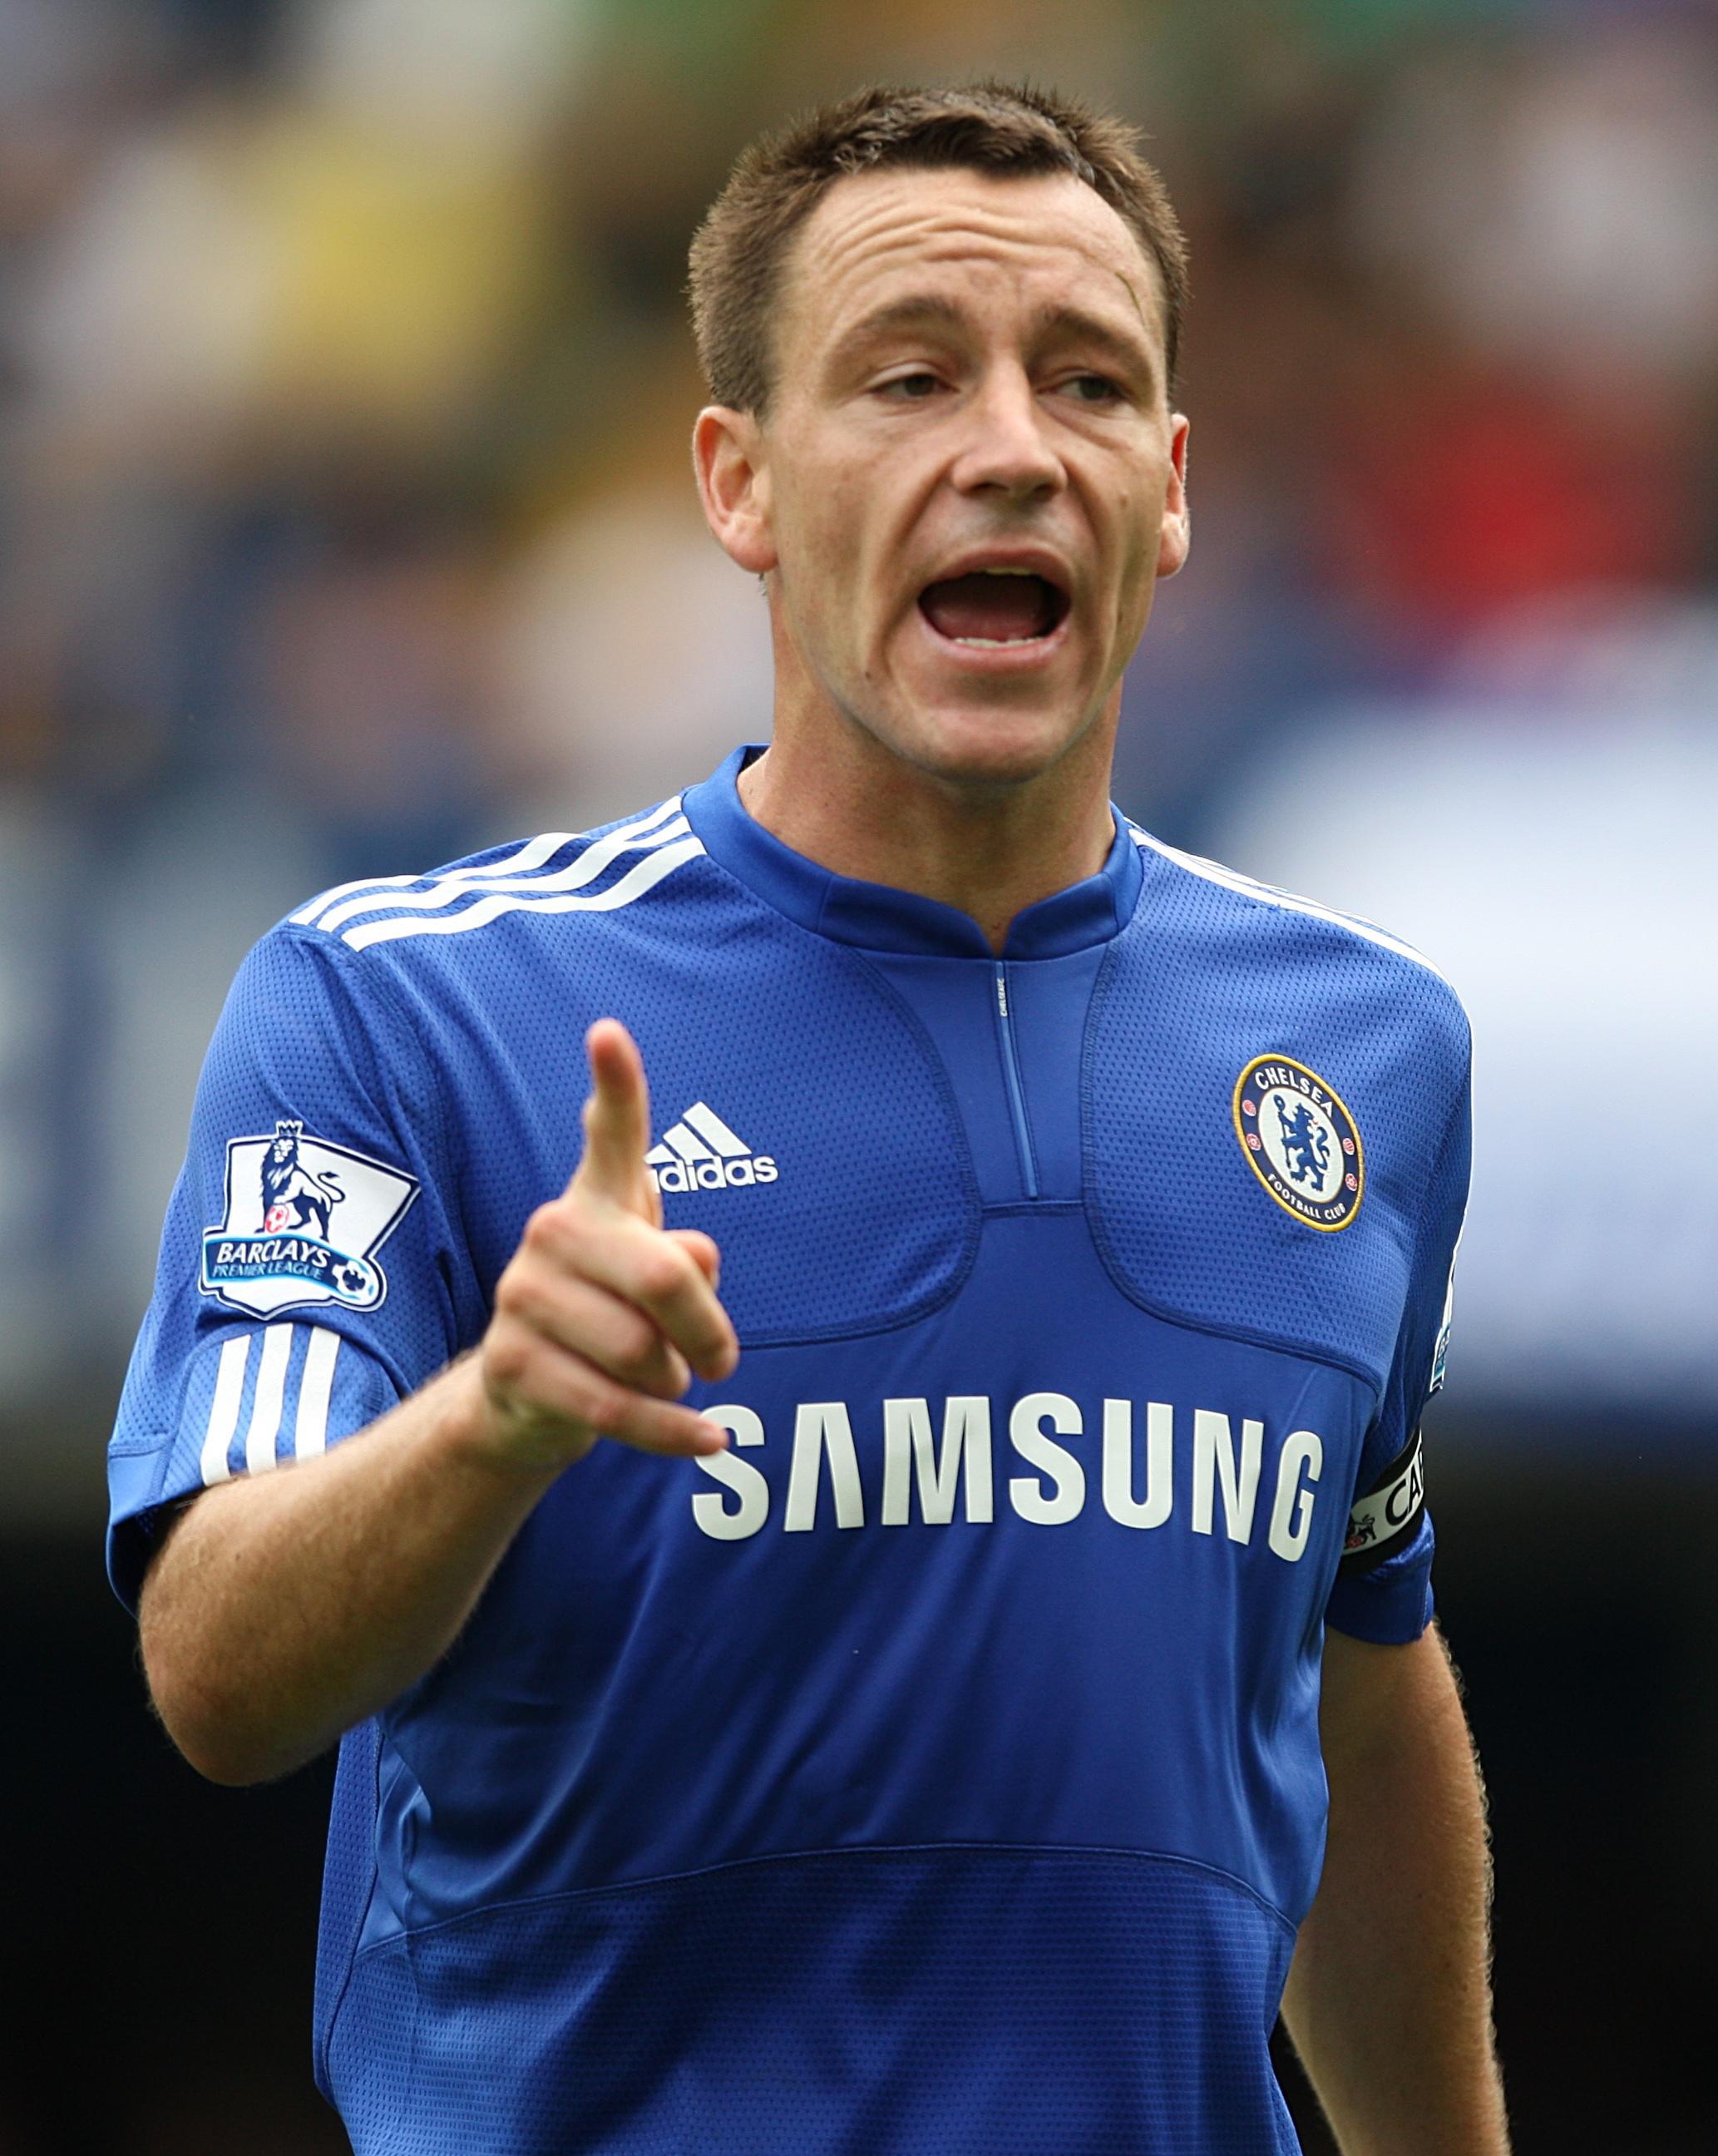 Captain. Leader. Legend